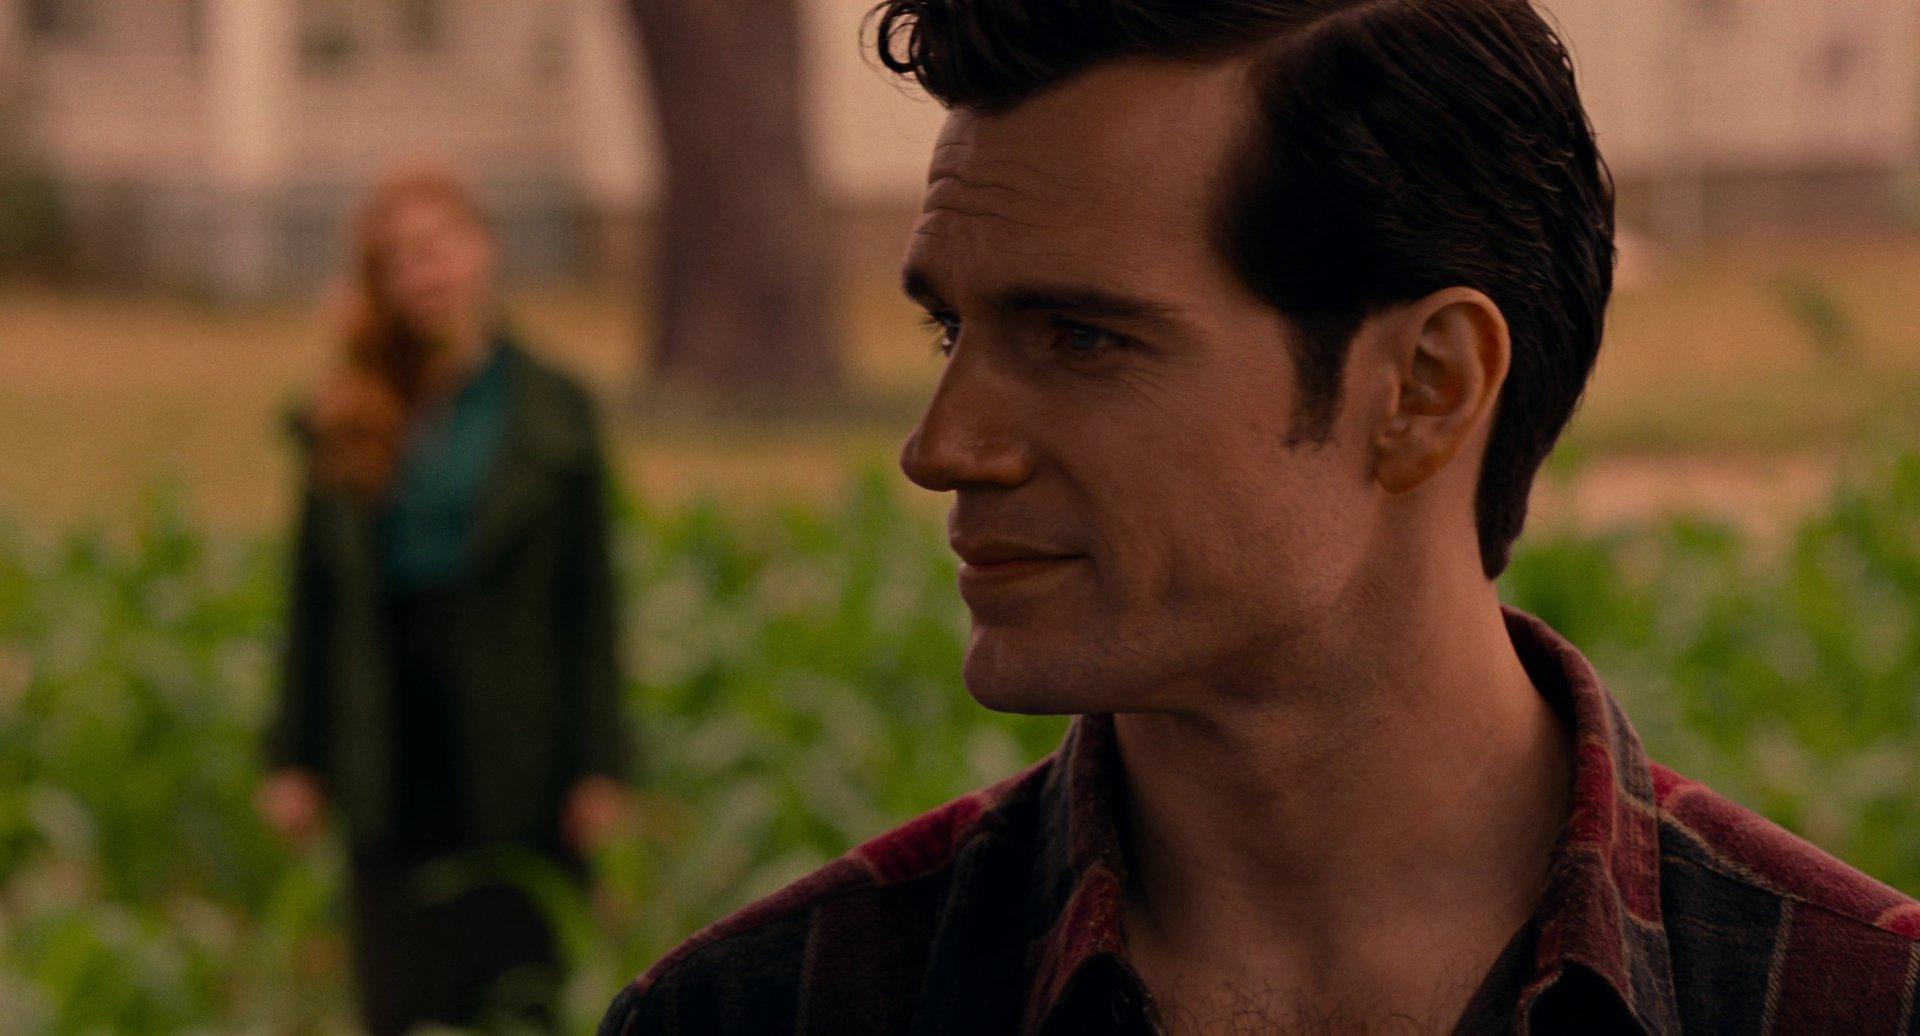 Justice League Clark Kent